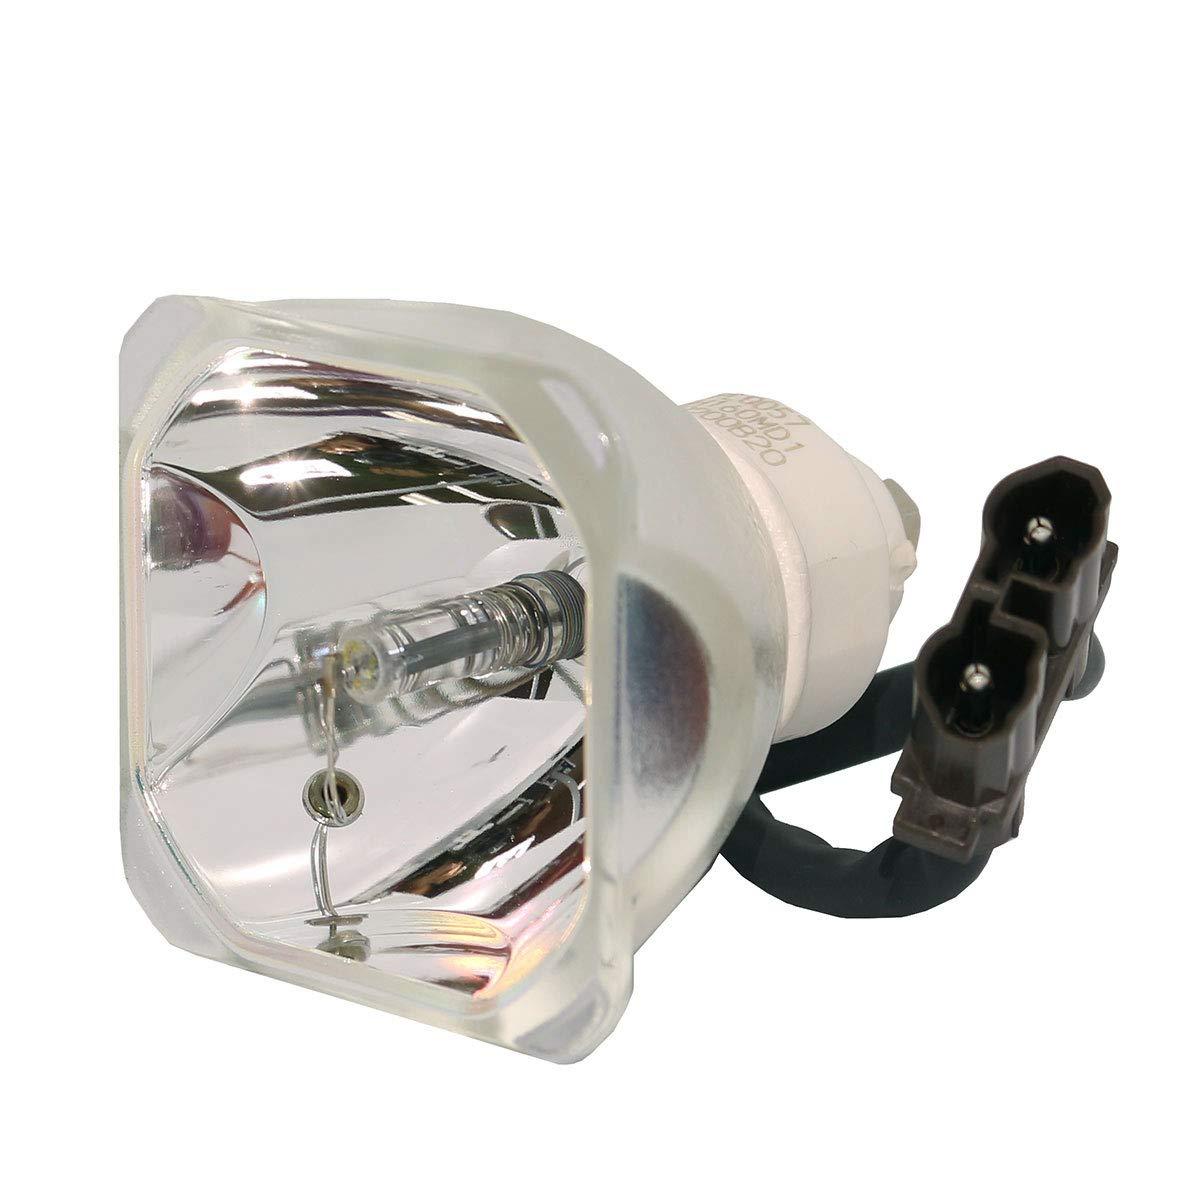 LYTIO プレミアム三菱 VLT-HC7000LP プロジェクターランプ915D116O12 (オリジナルOEM電球)   B07JWJK18L